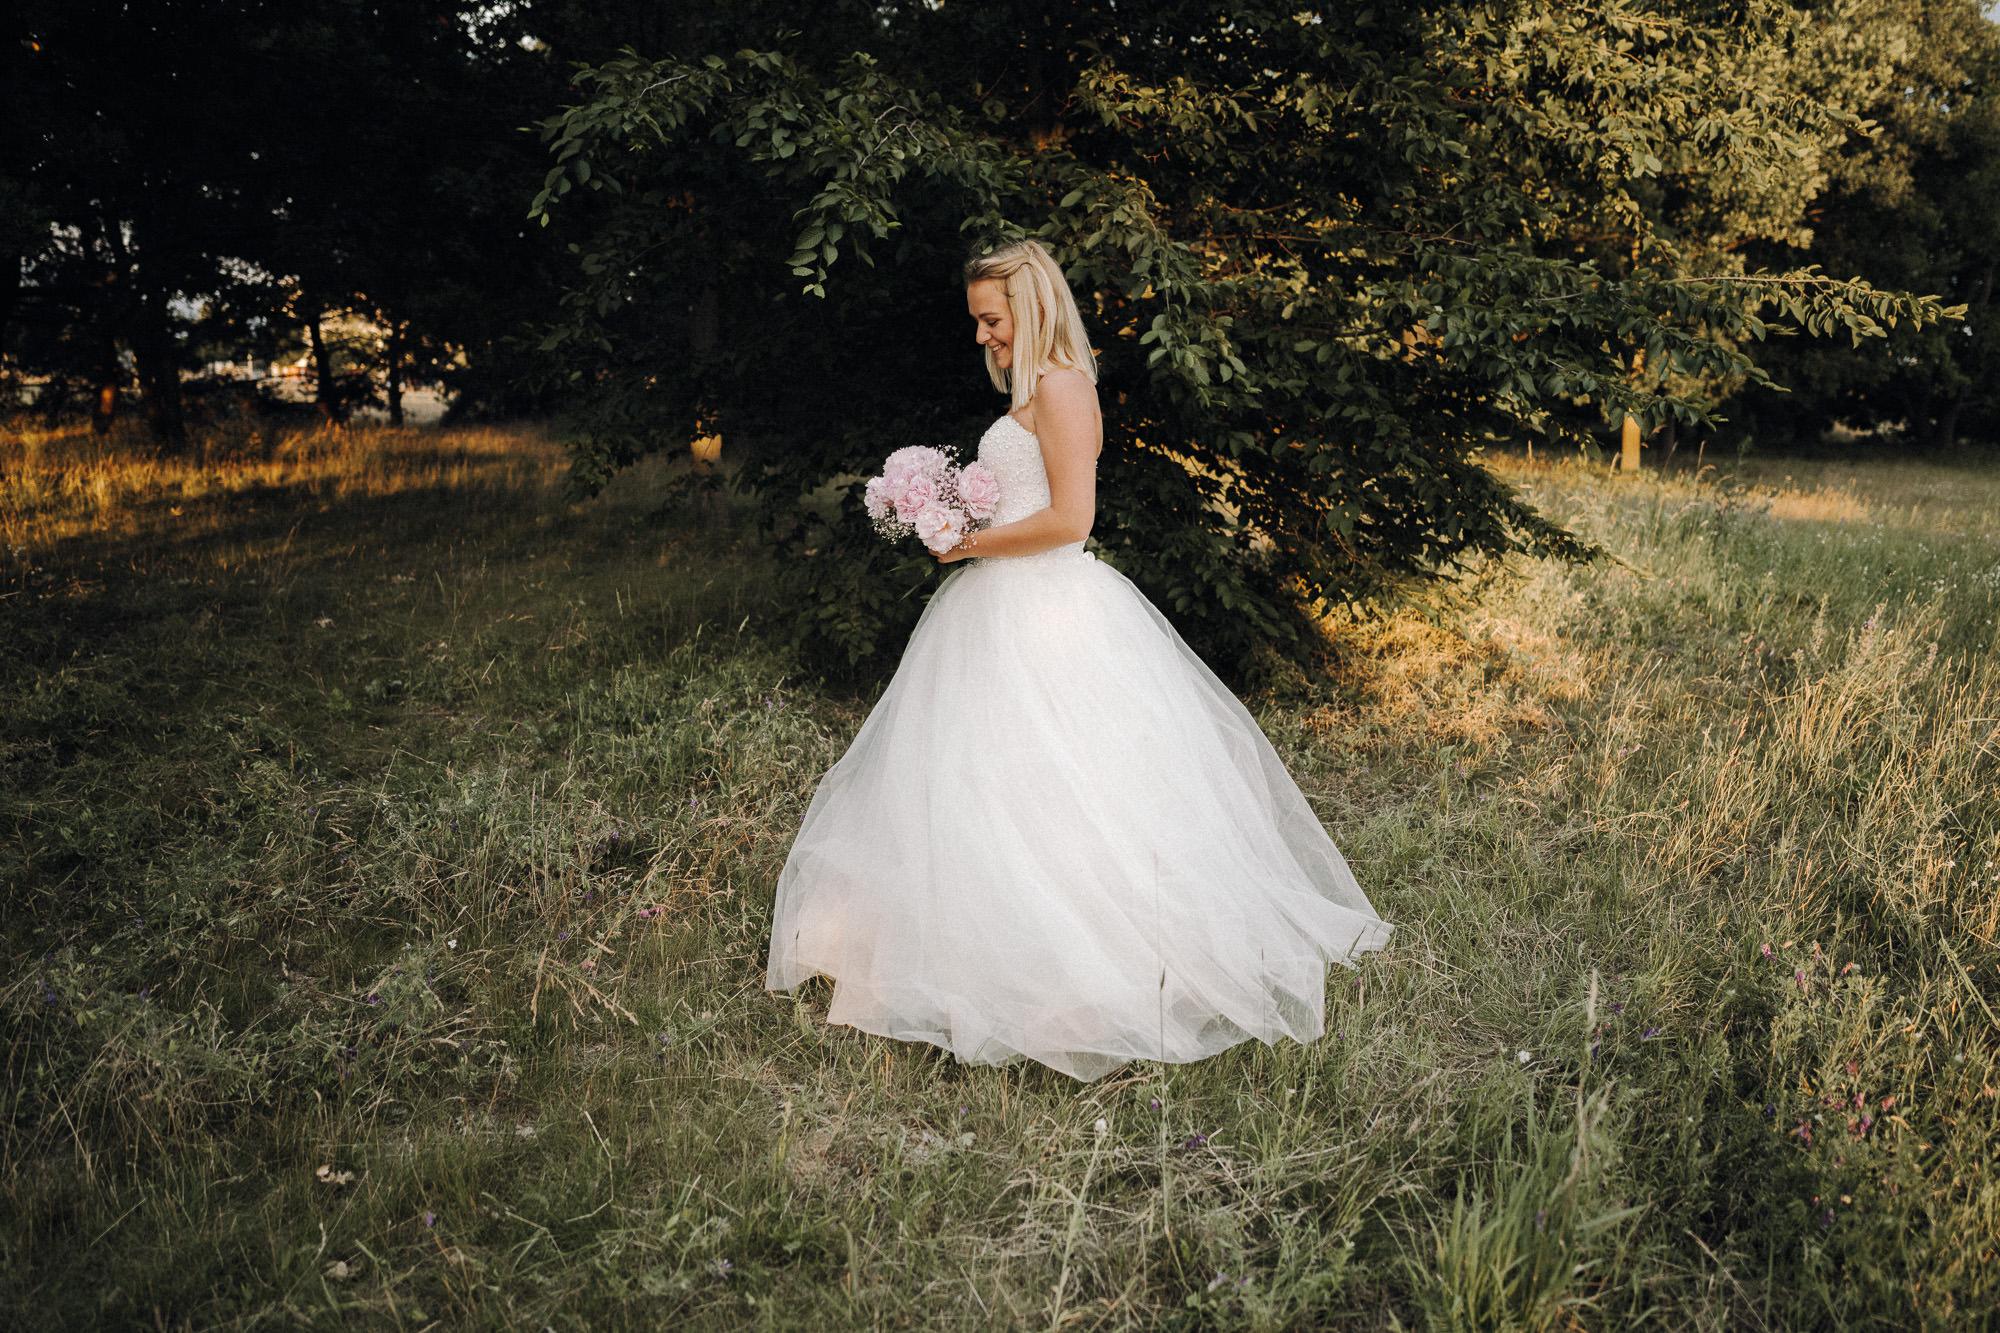 waltsmedia-hochzeitsreportage-after-wedding-shooting-berlin-14